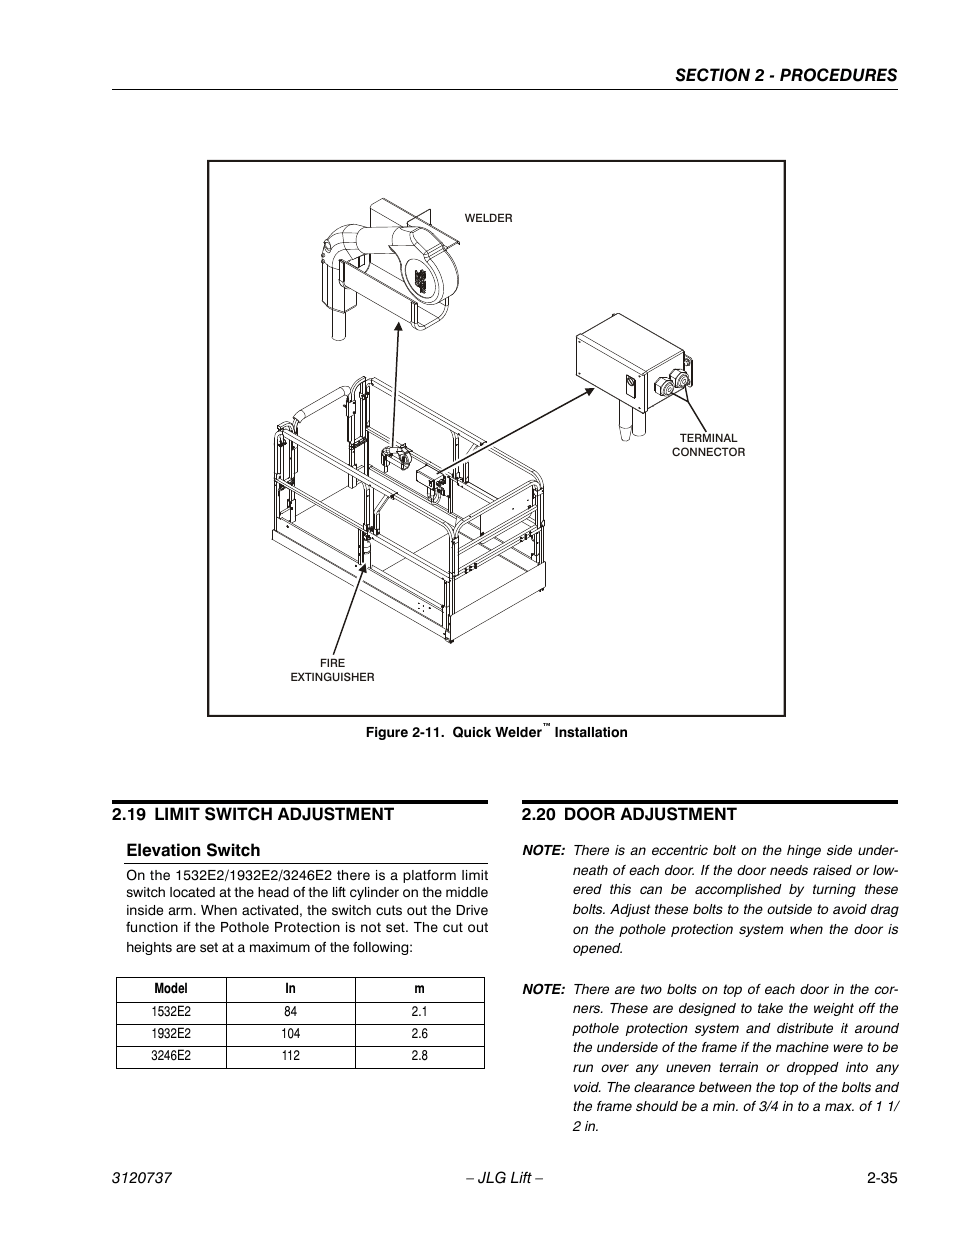 cb750 simple wiring diagram home receptacle diagrams jlg 2032e2 : 25 images - | honlapkeszites.co